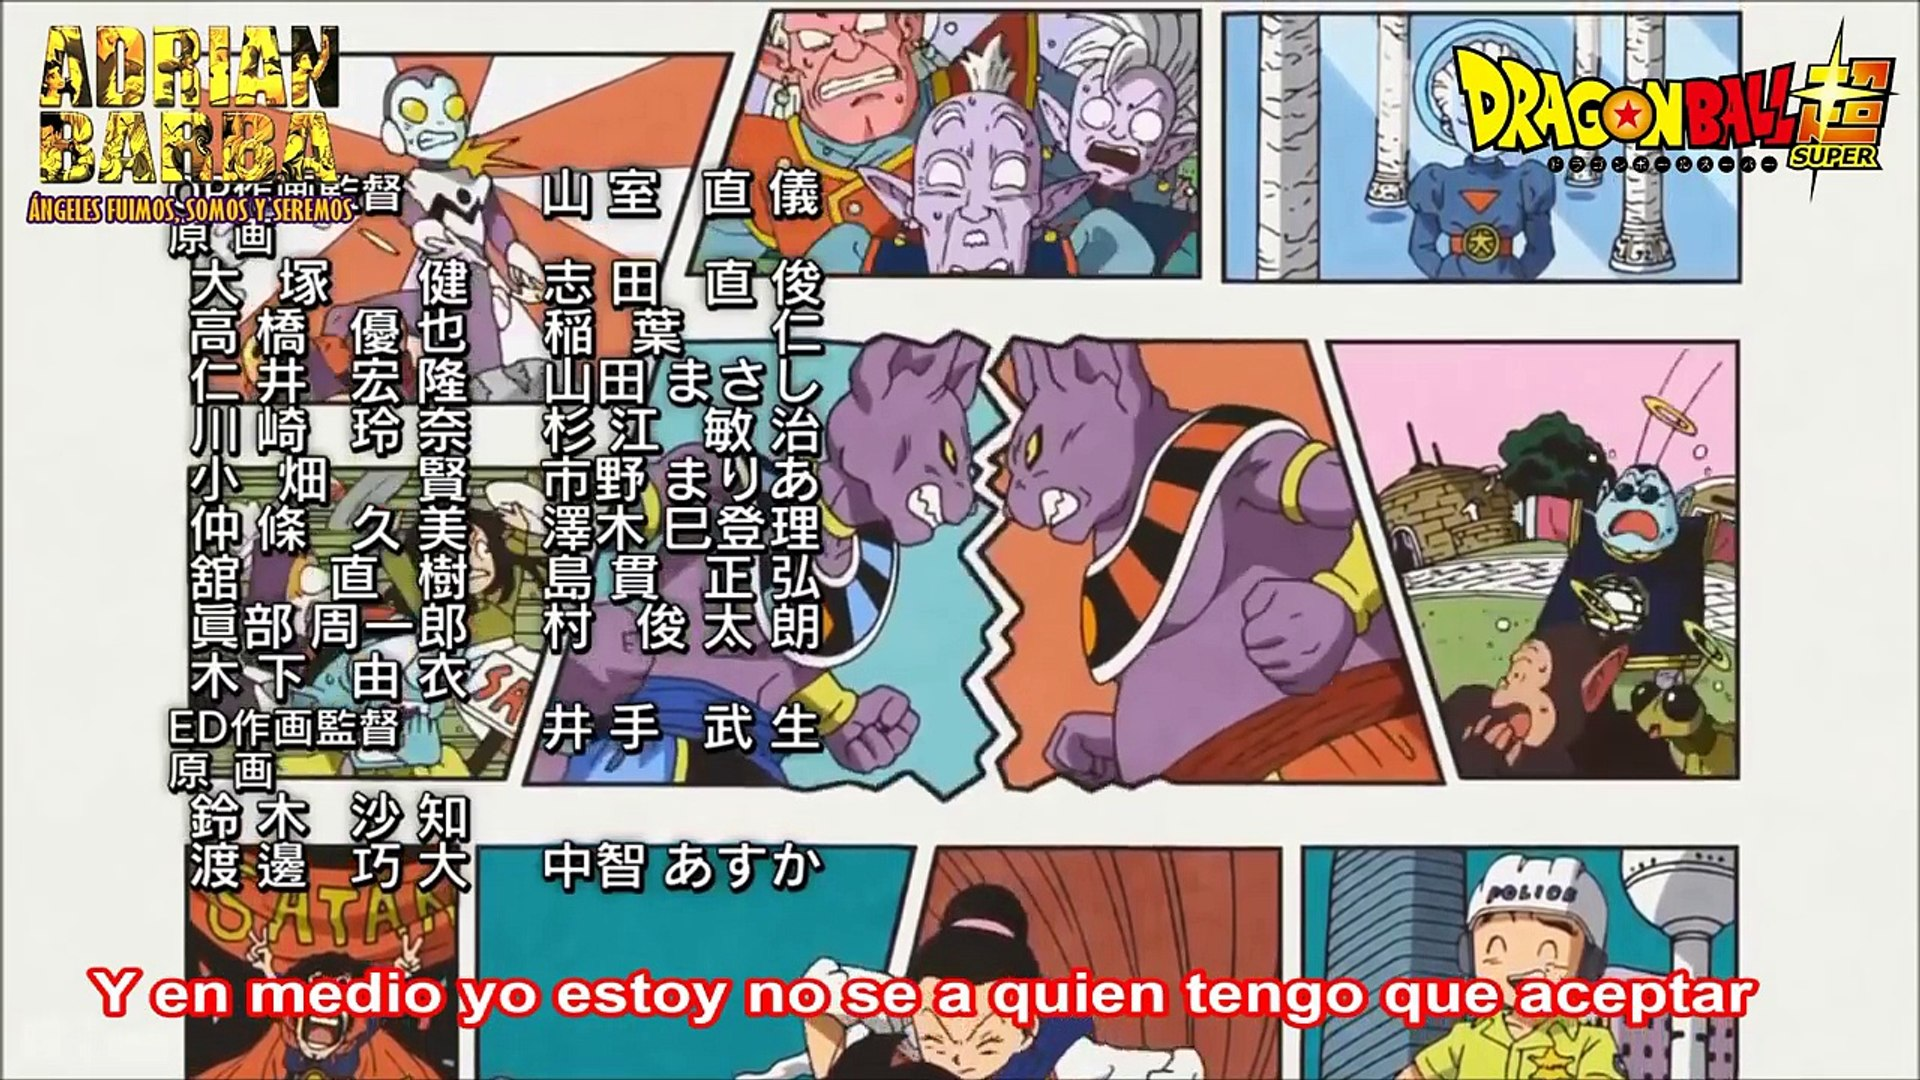 Dragon Ball Super - Ángeles y Demonios (Ending 5 Cover en Español Latino)